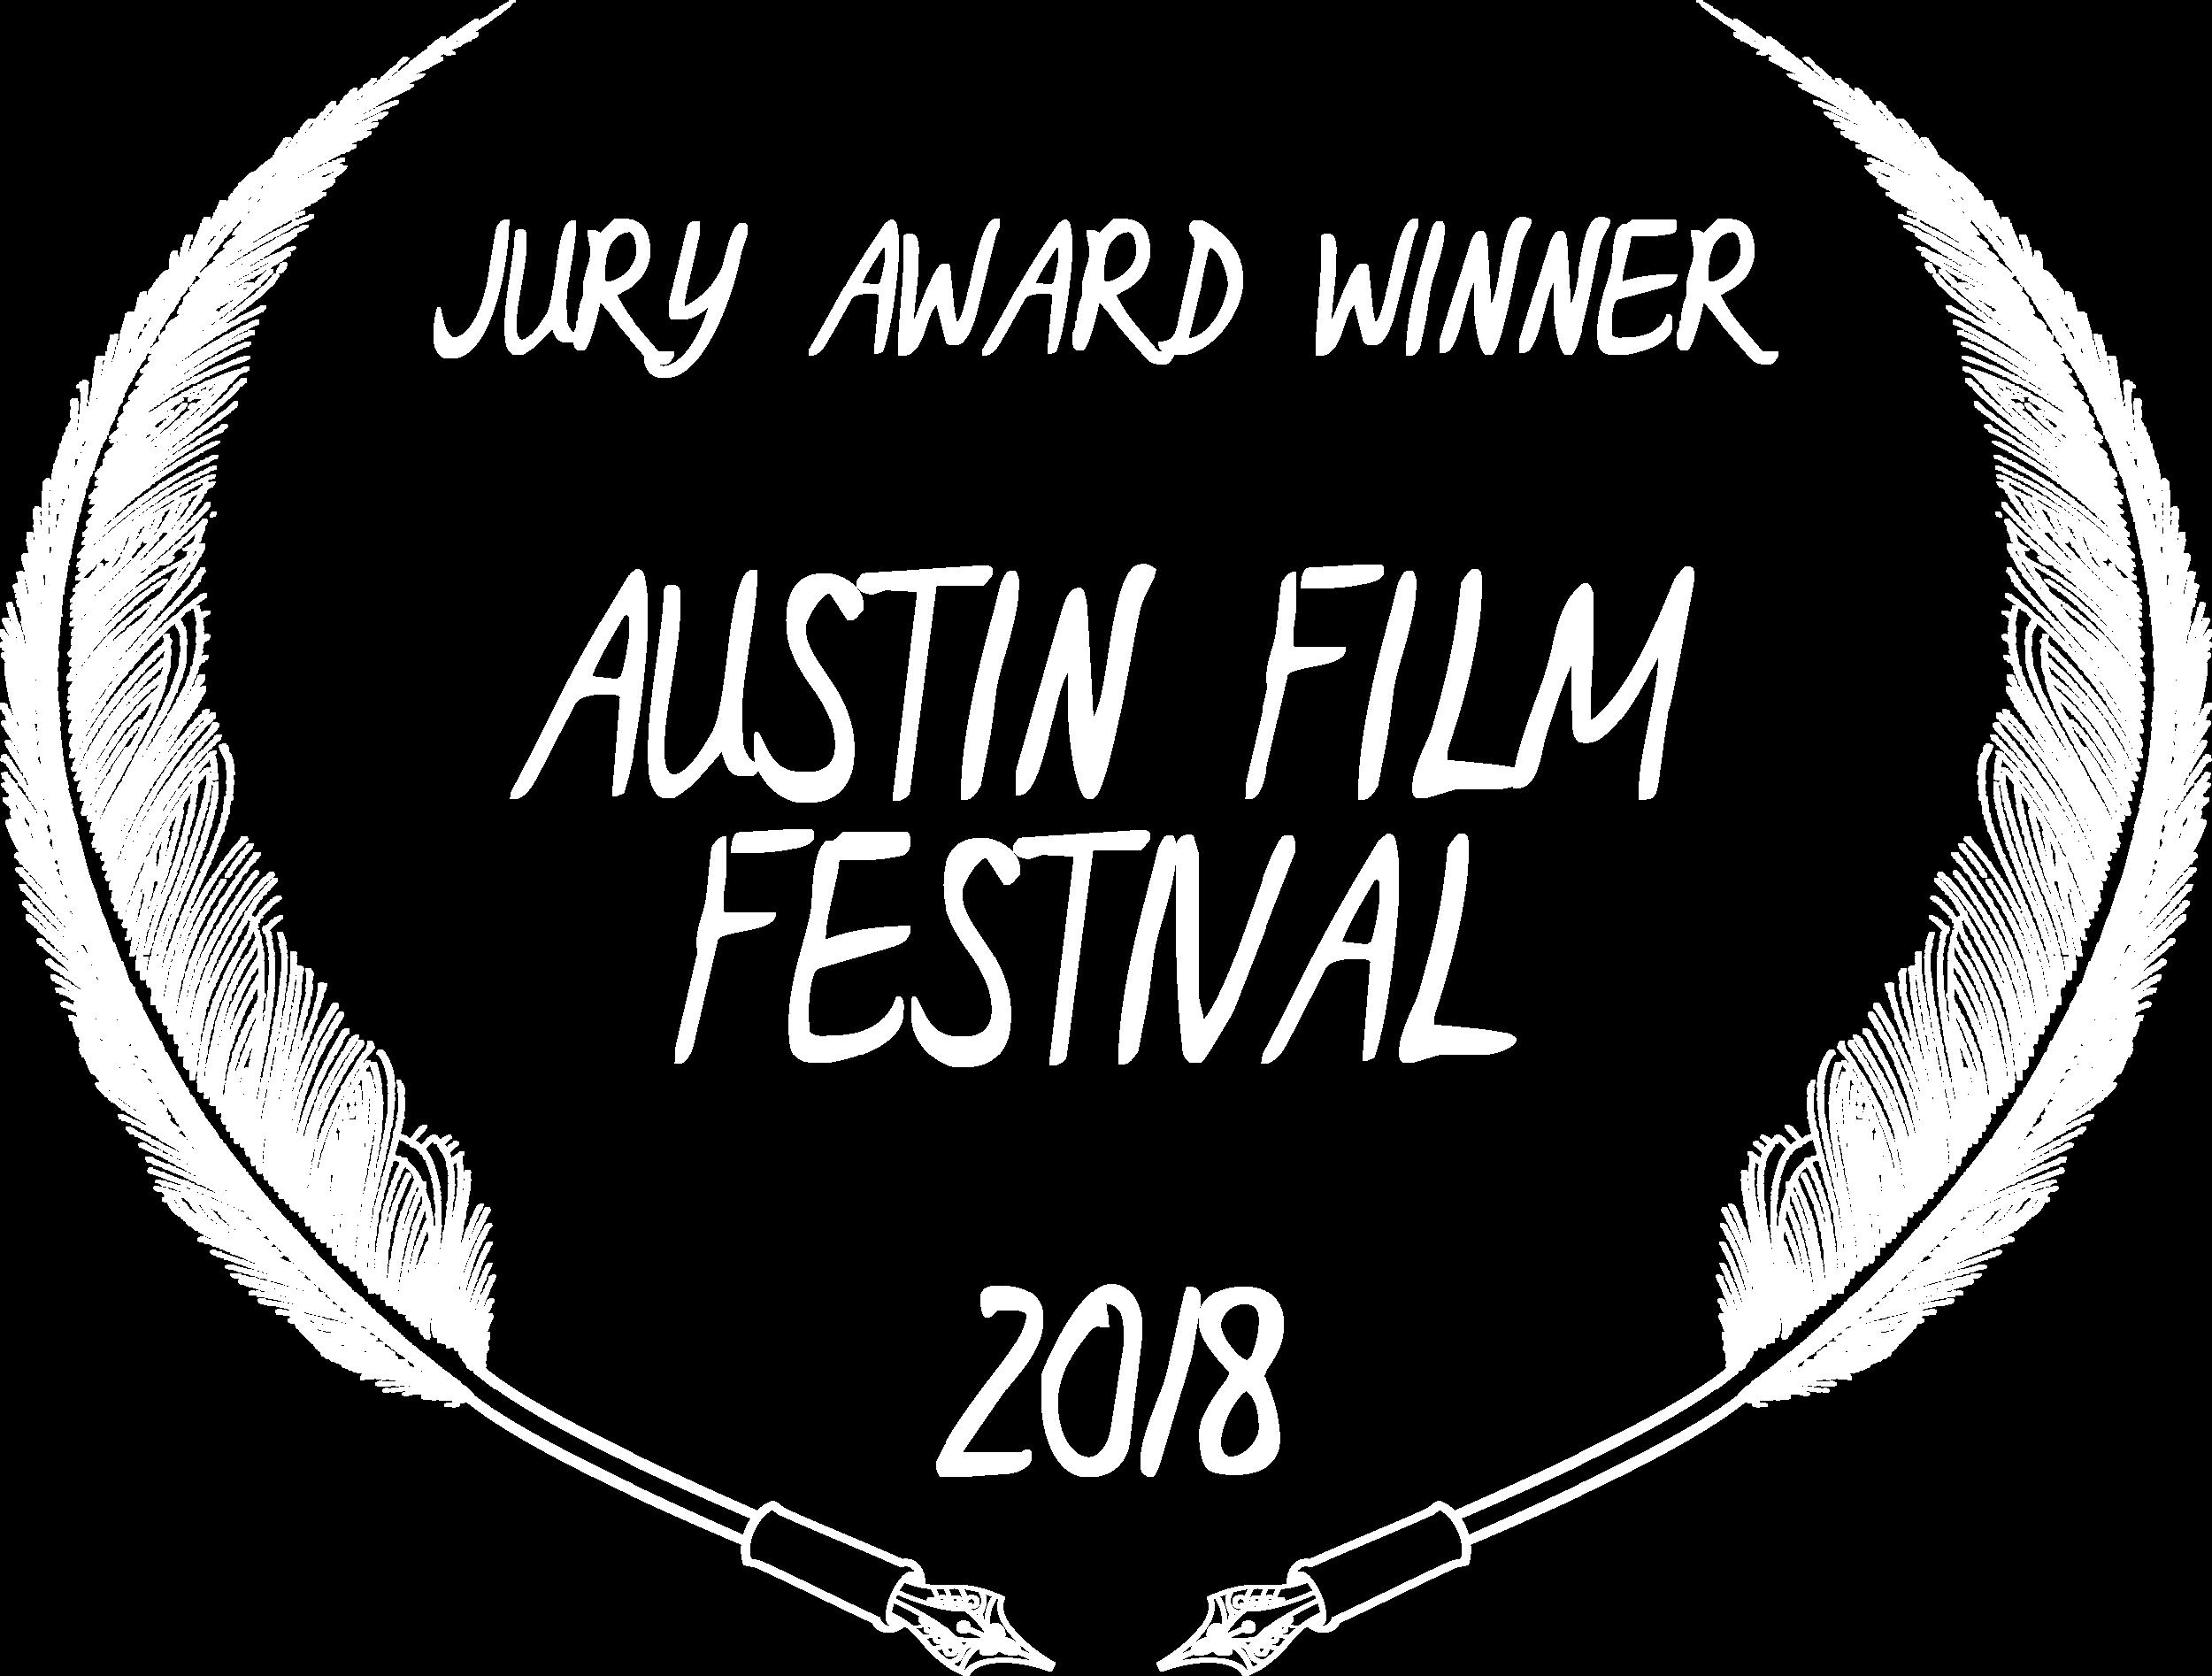 austin film festival Jury laurel vector.png